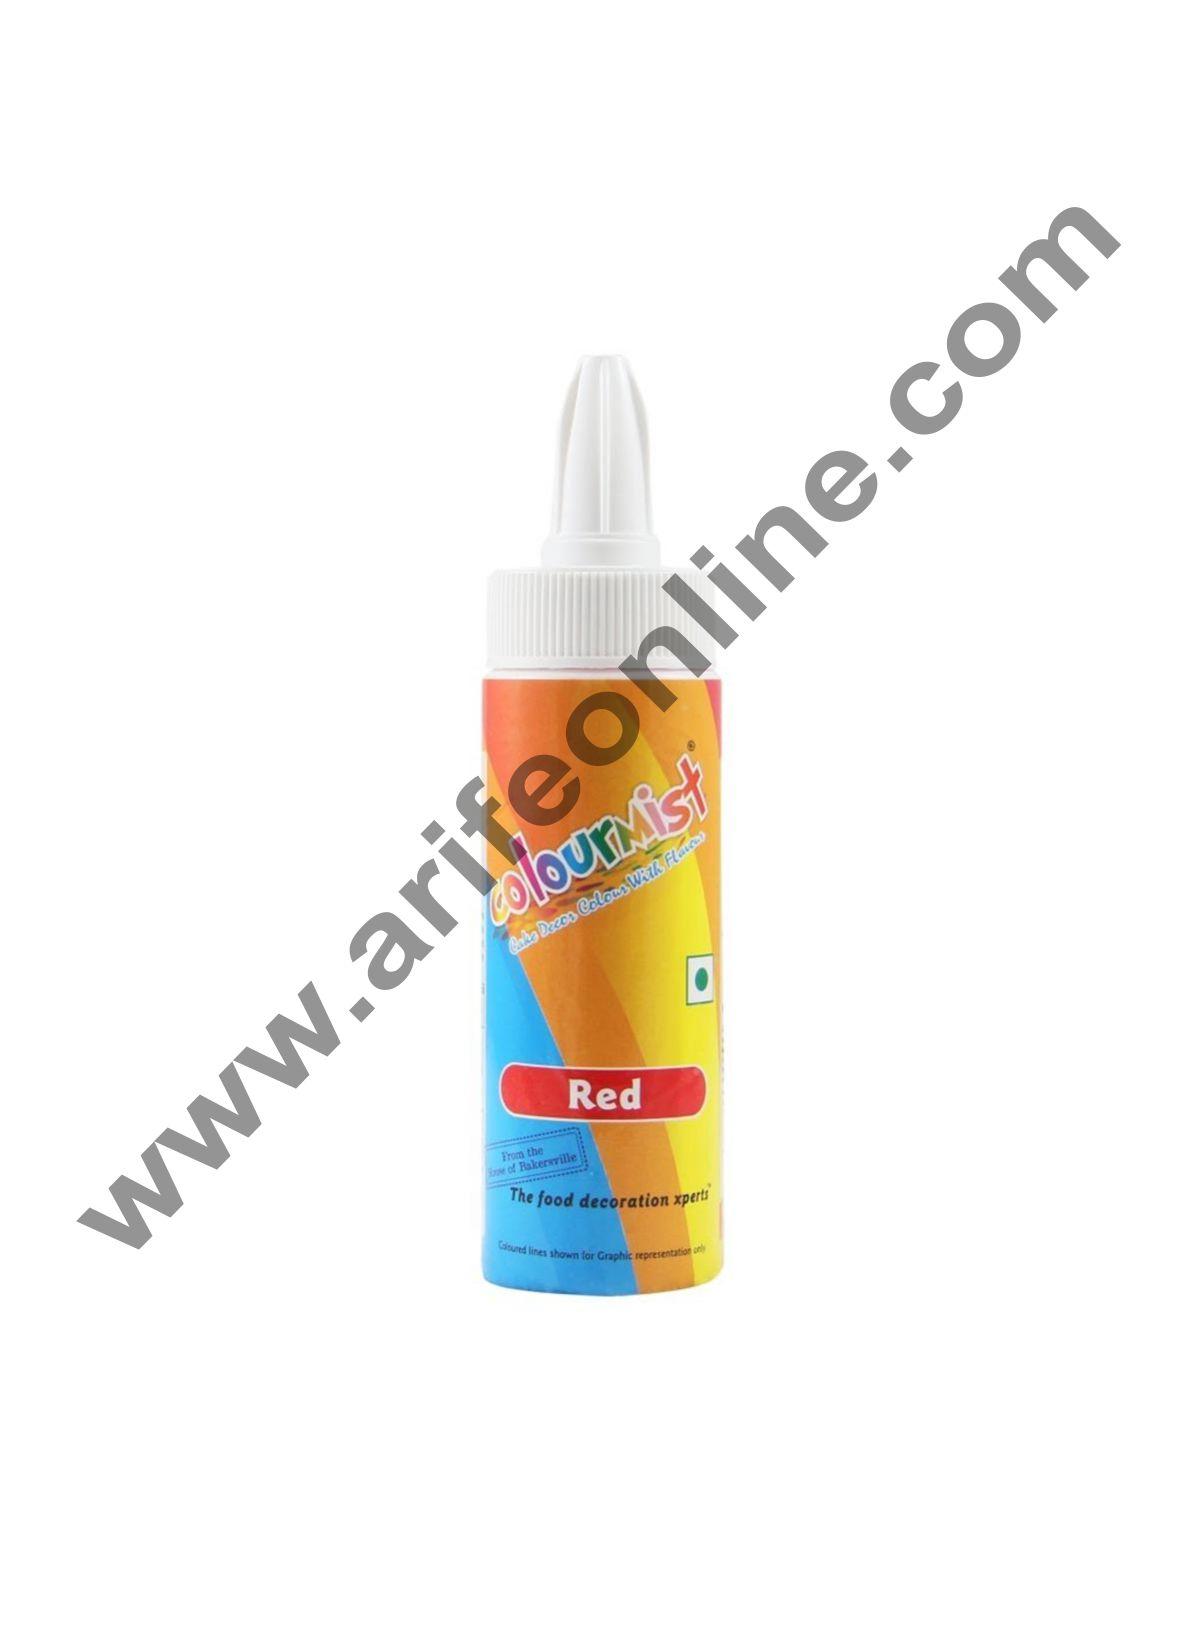 Colourmist Powder Spray (Red), 60gm